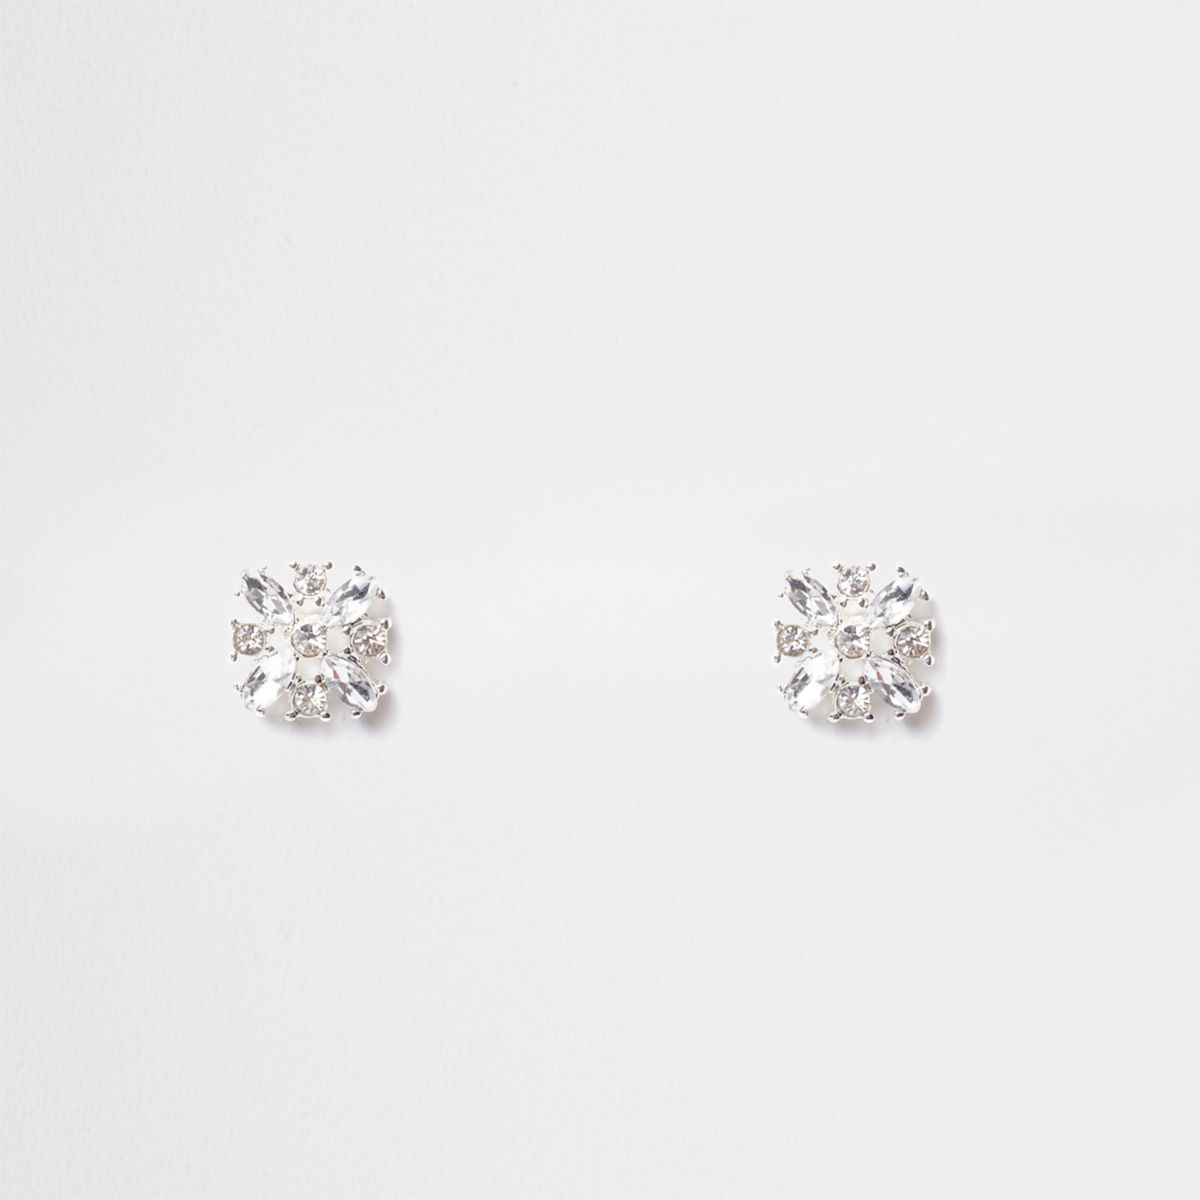 Silver tone diamante stud earring